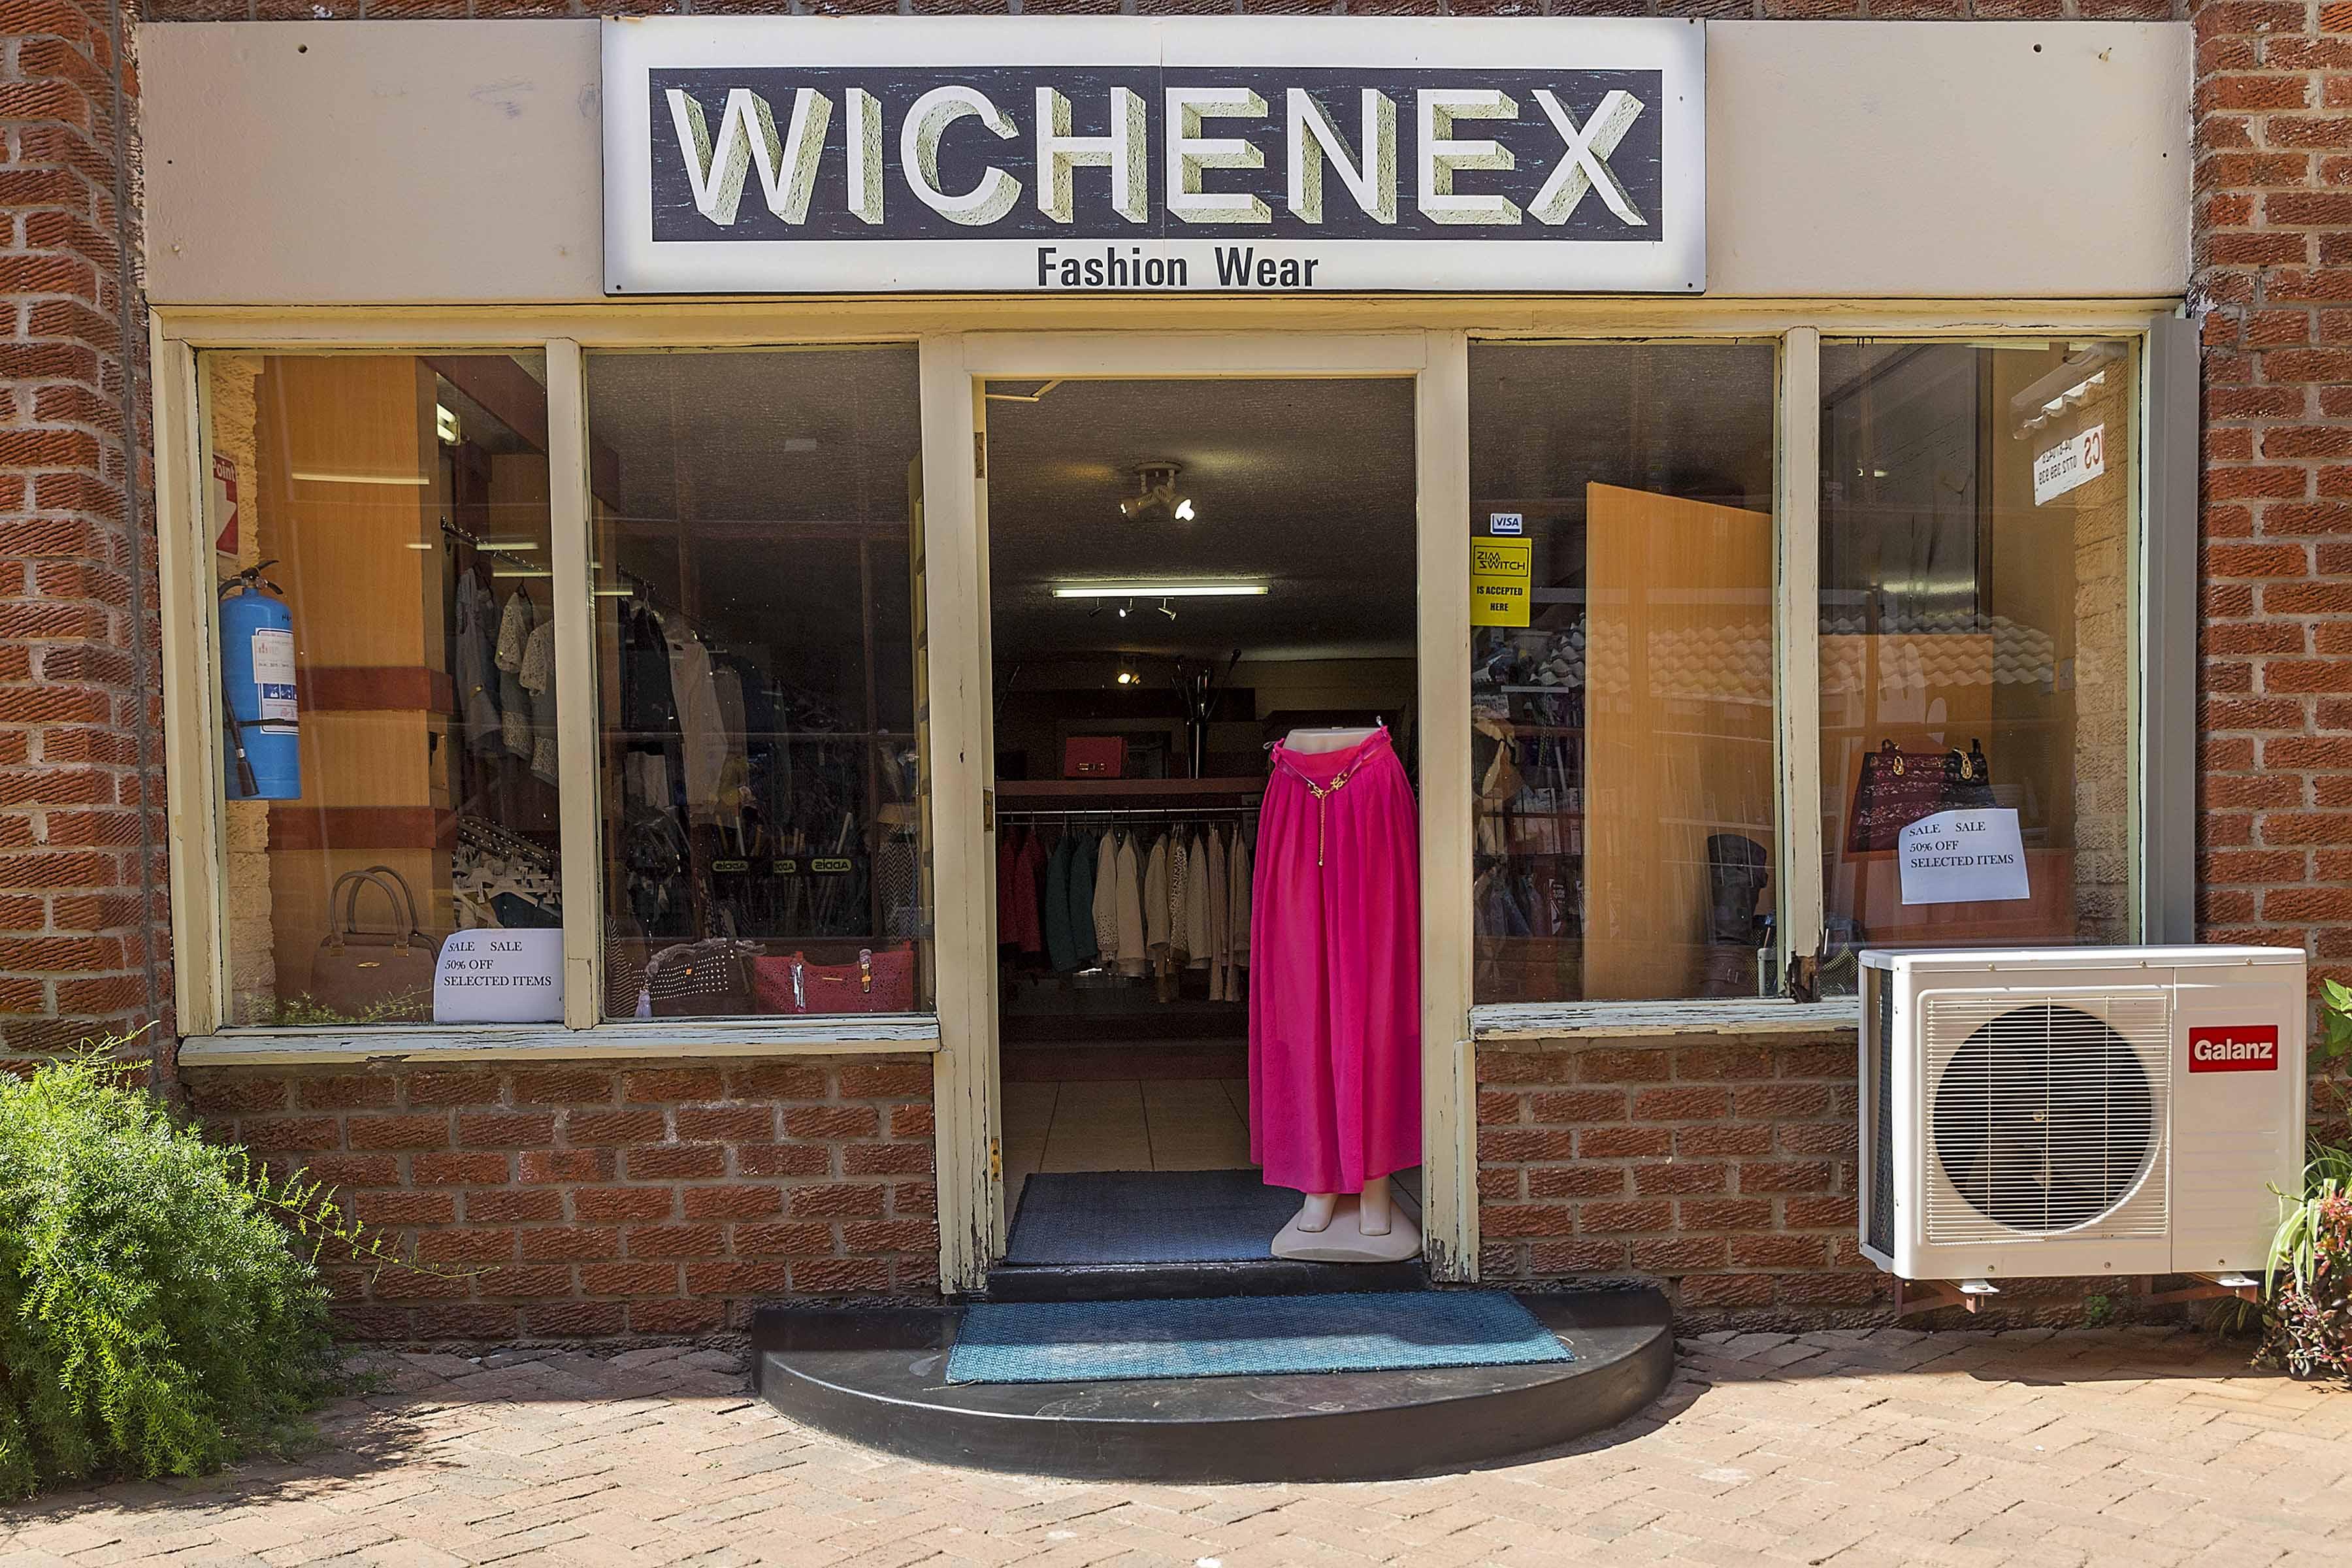 Wichenex Fashions